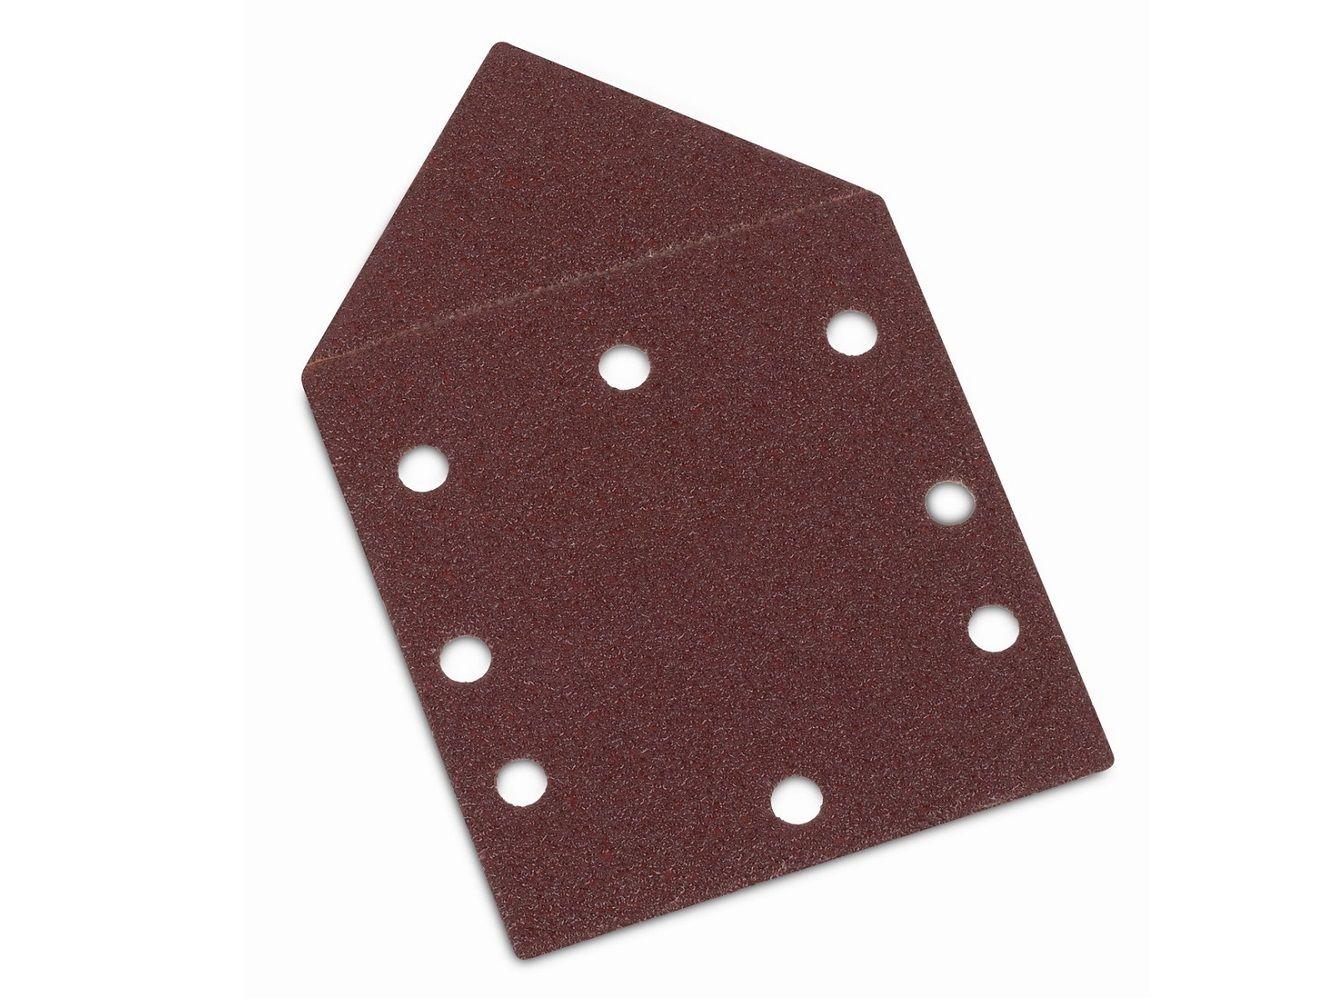 5x Brusný papír - brusivo pro multibrusku PowerPlus POWX0485 (KREATOR KRT220109 TOP) - zr. 240